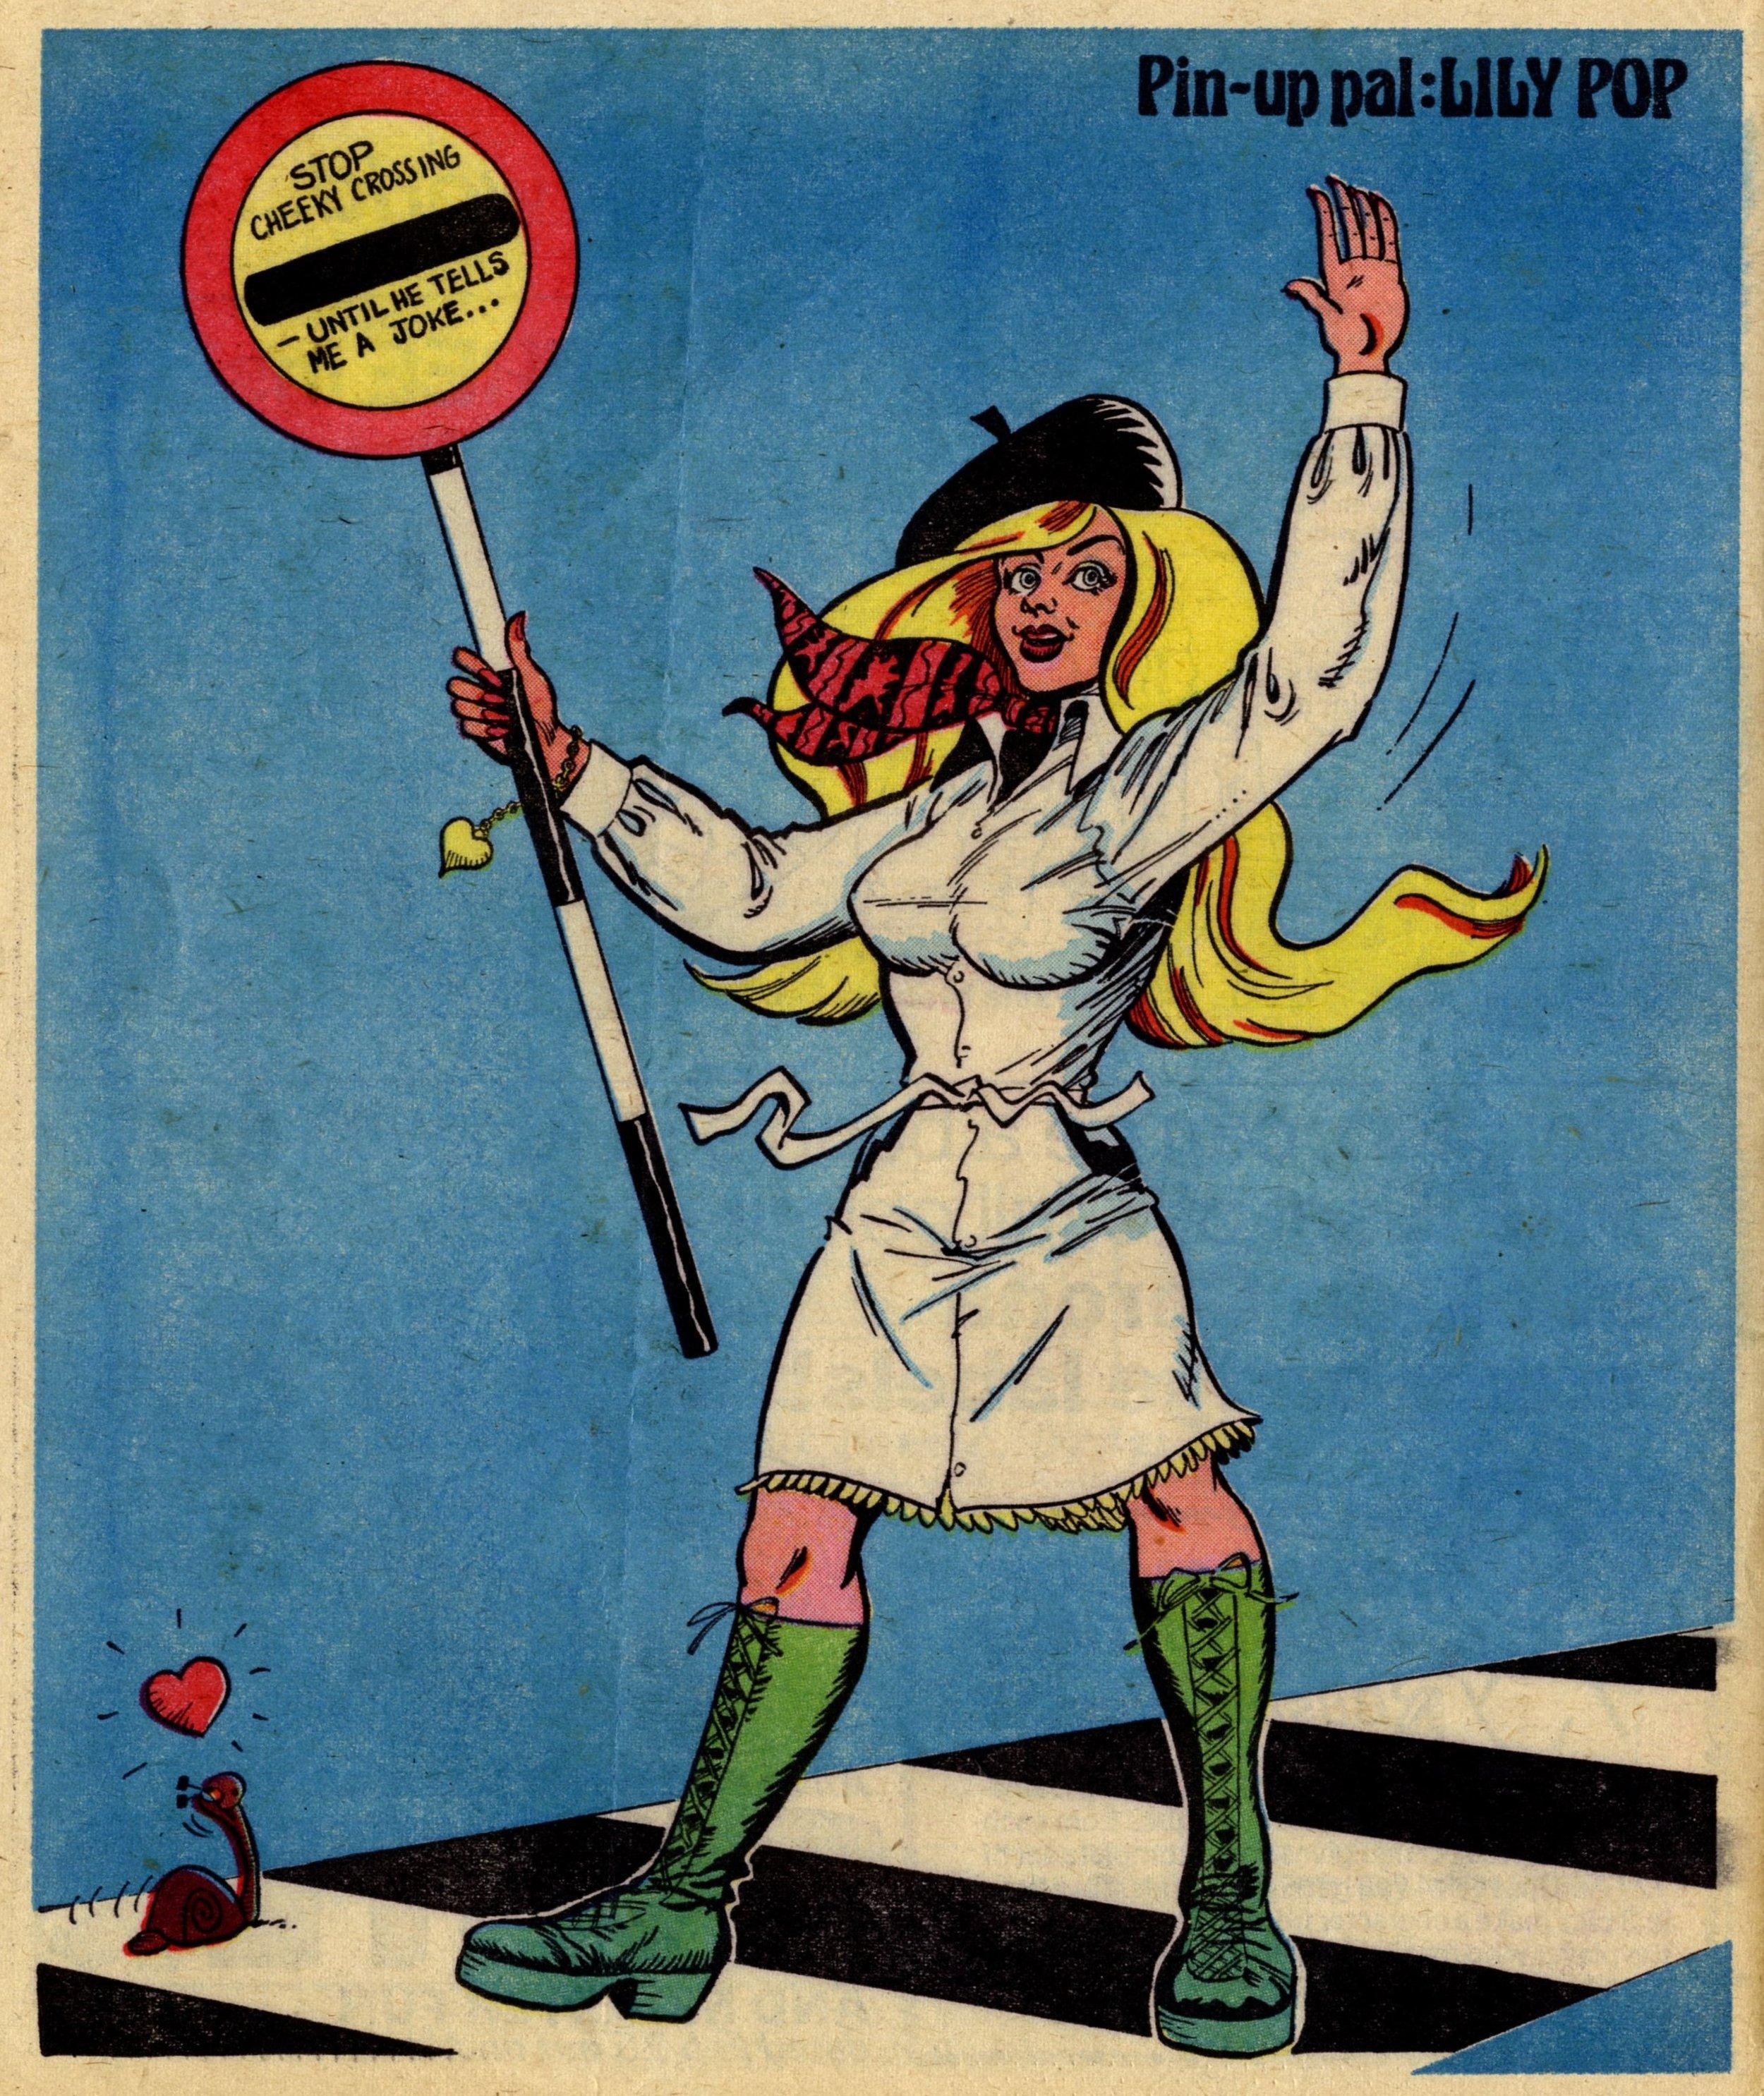 Pin-up Pal: Lily Pop (artist Frank McDiarmid), 18 February 1978